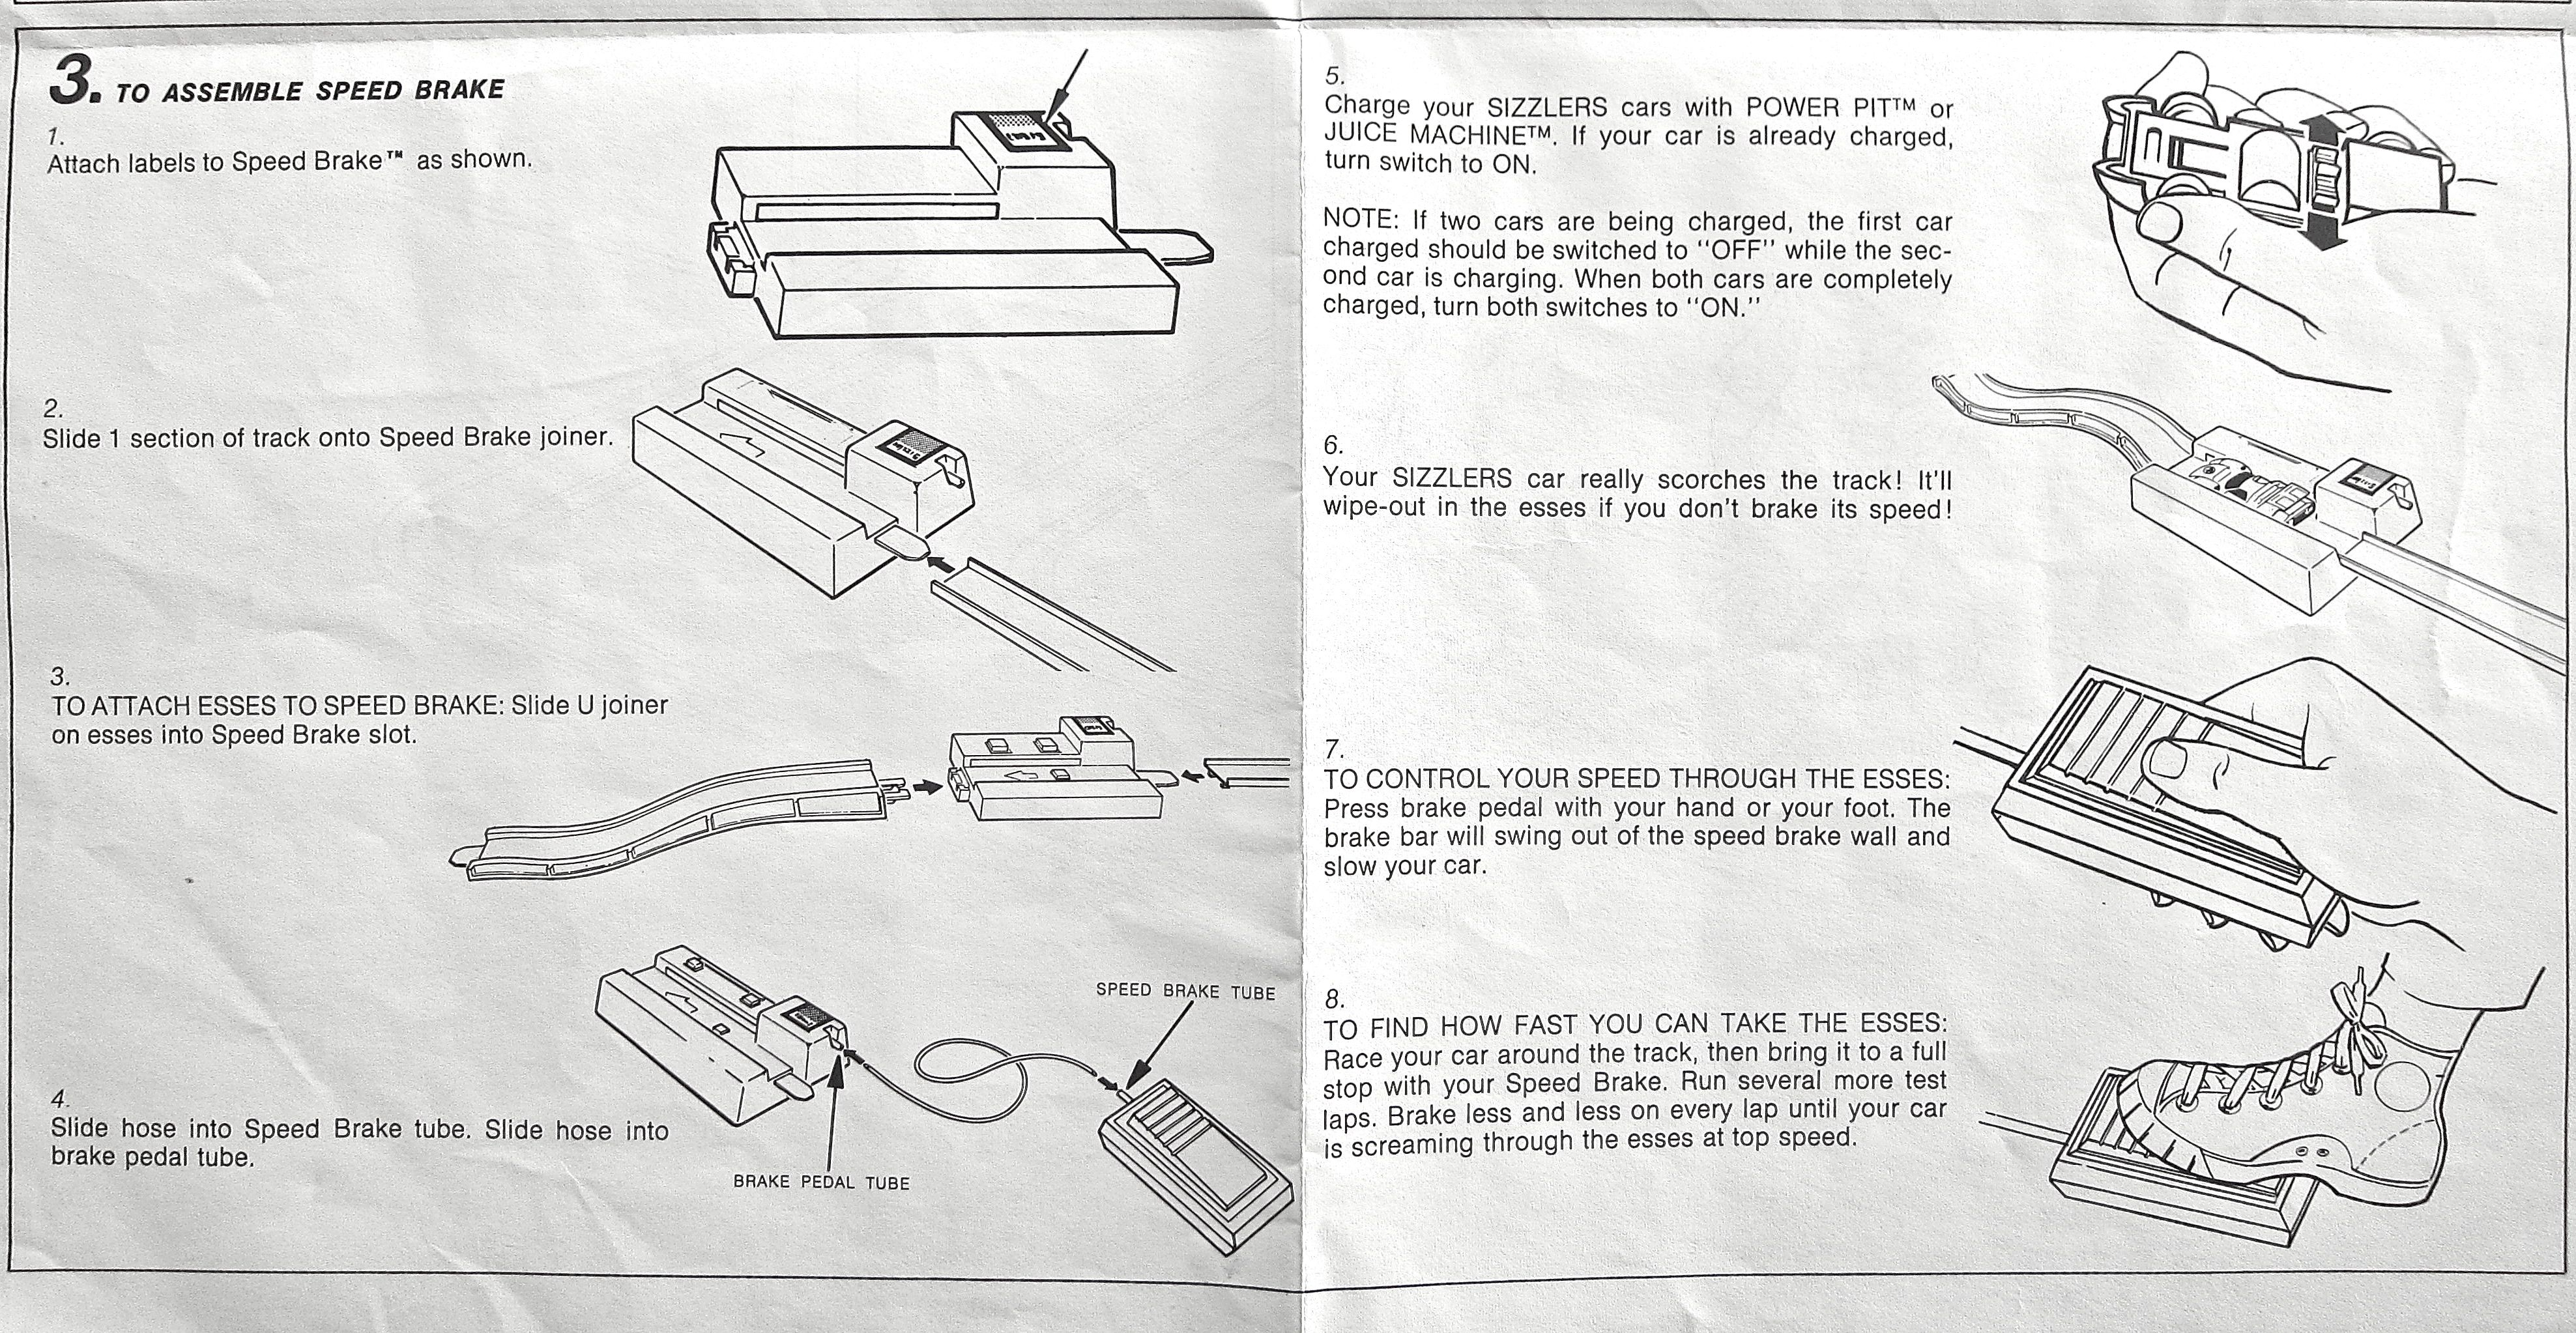 hot wheels trick tracks instructions